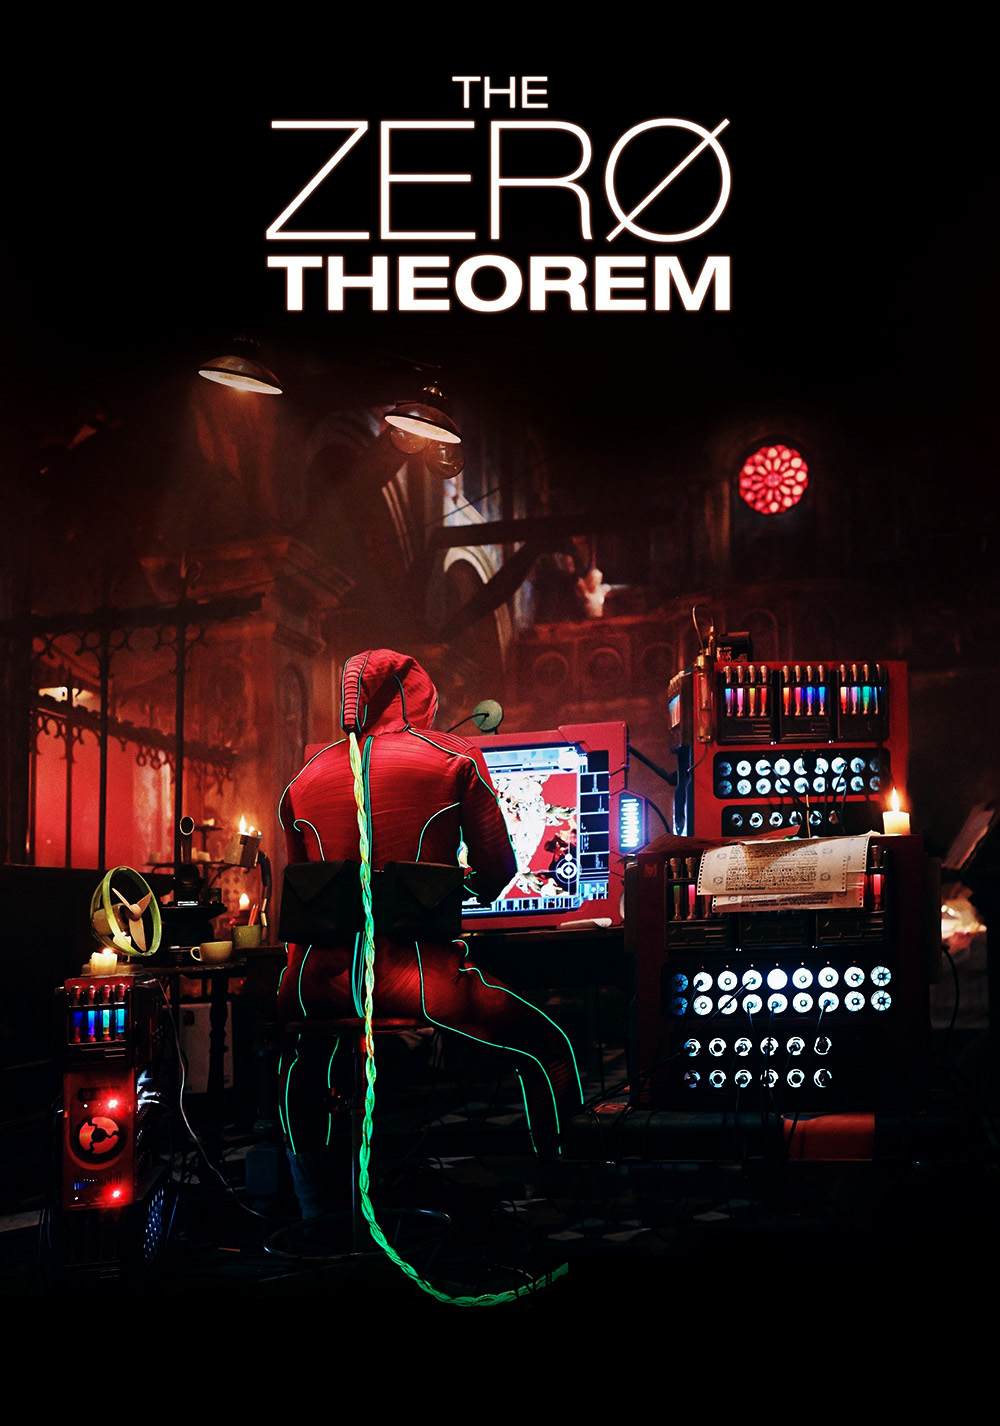 The Zero Theorem | Movie fanart | fanart.tv